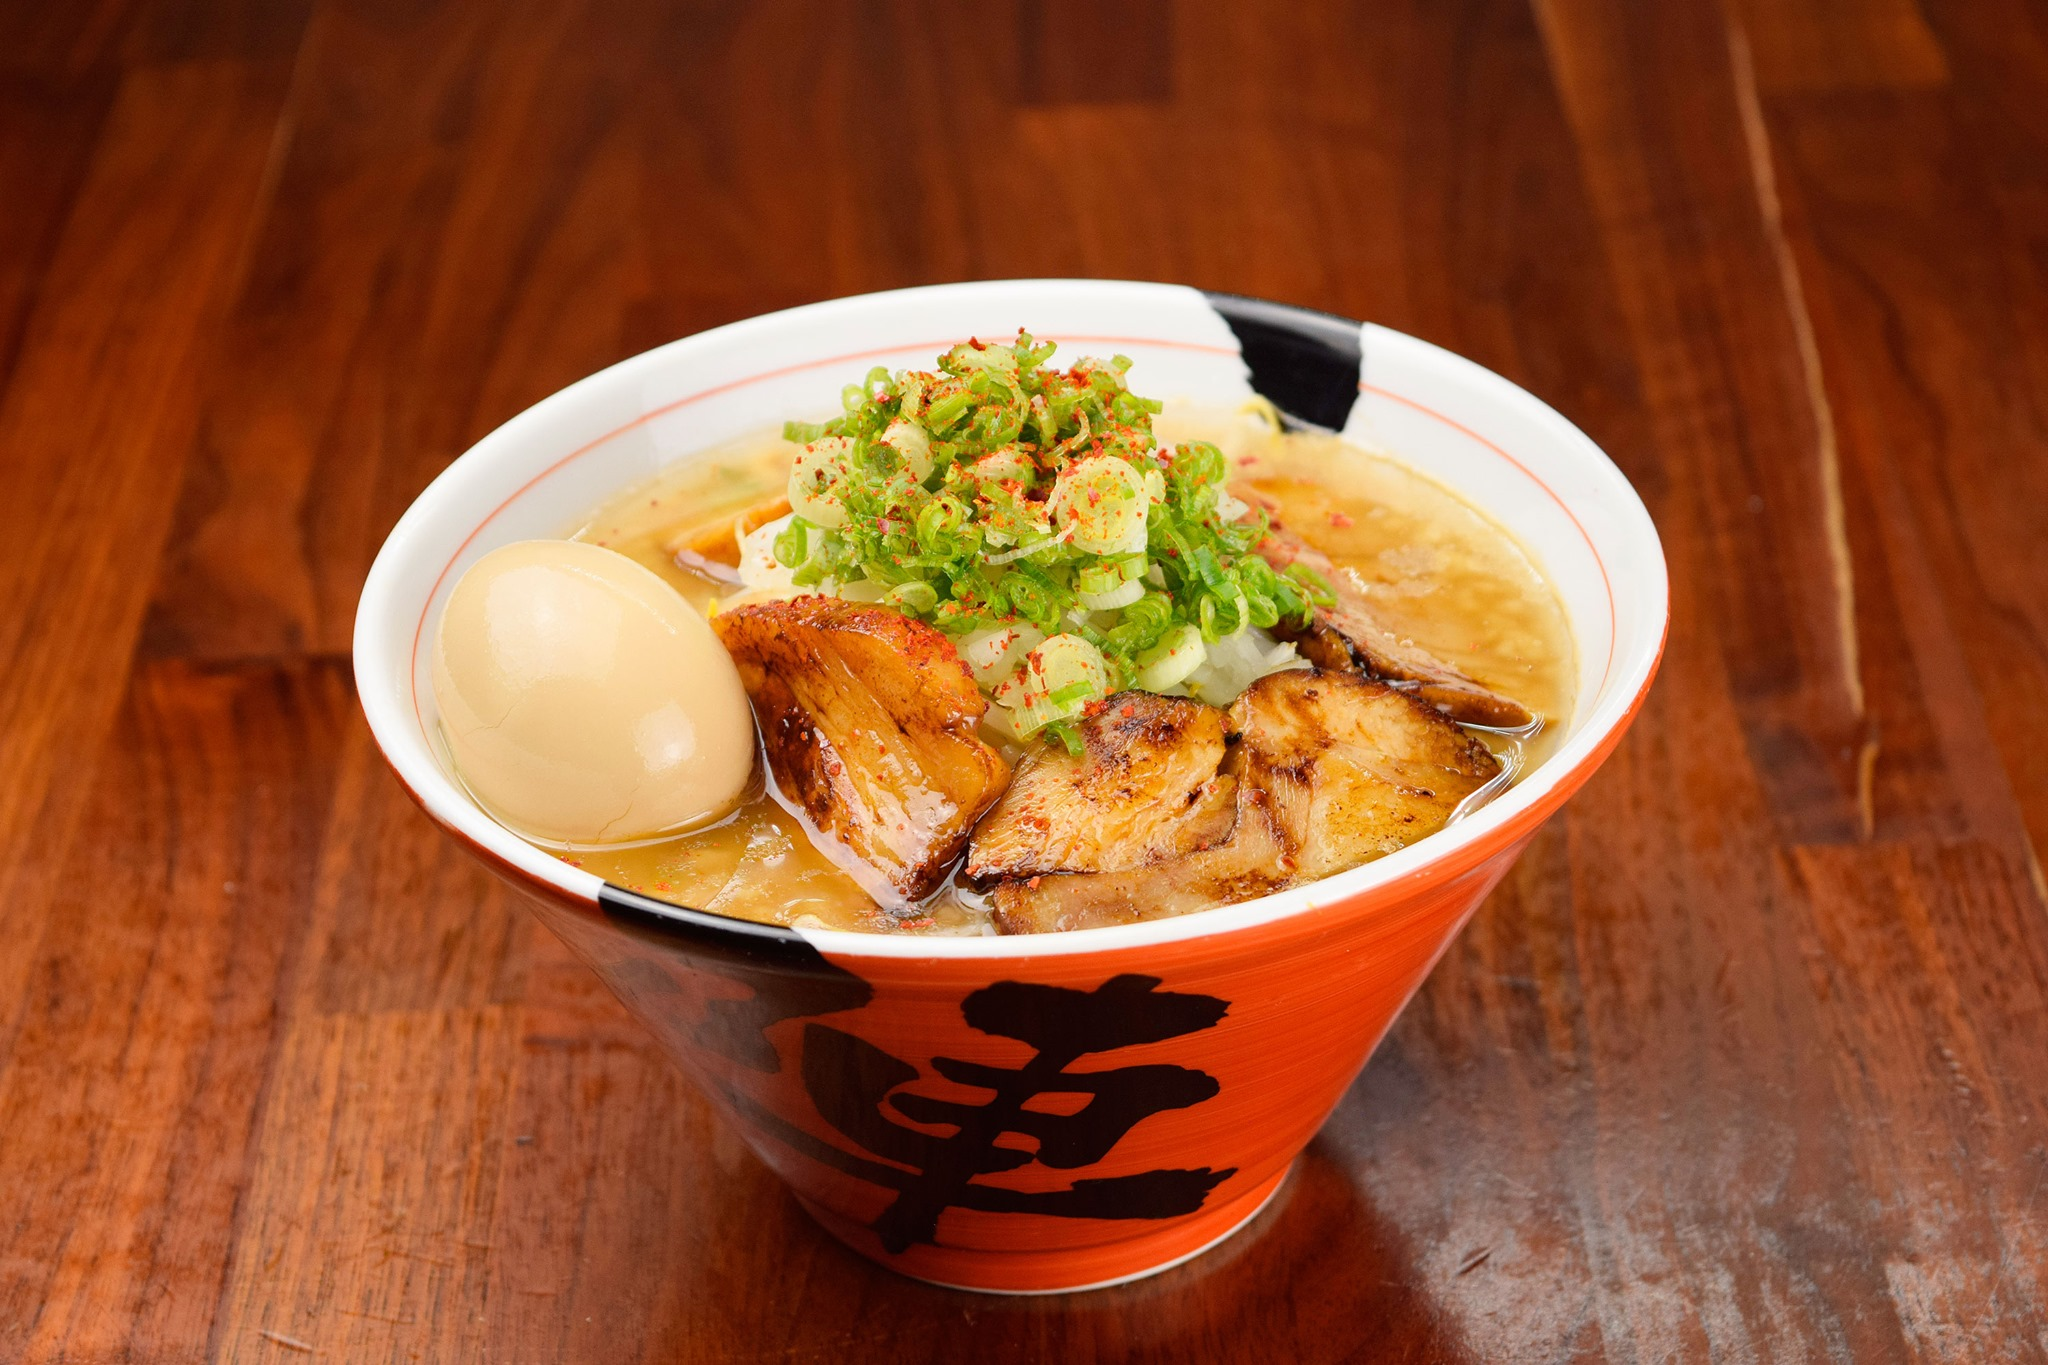 A red bowl containing Jinya's Cha Cha Cha ramen